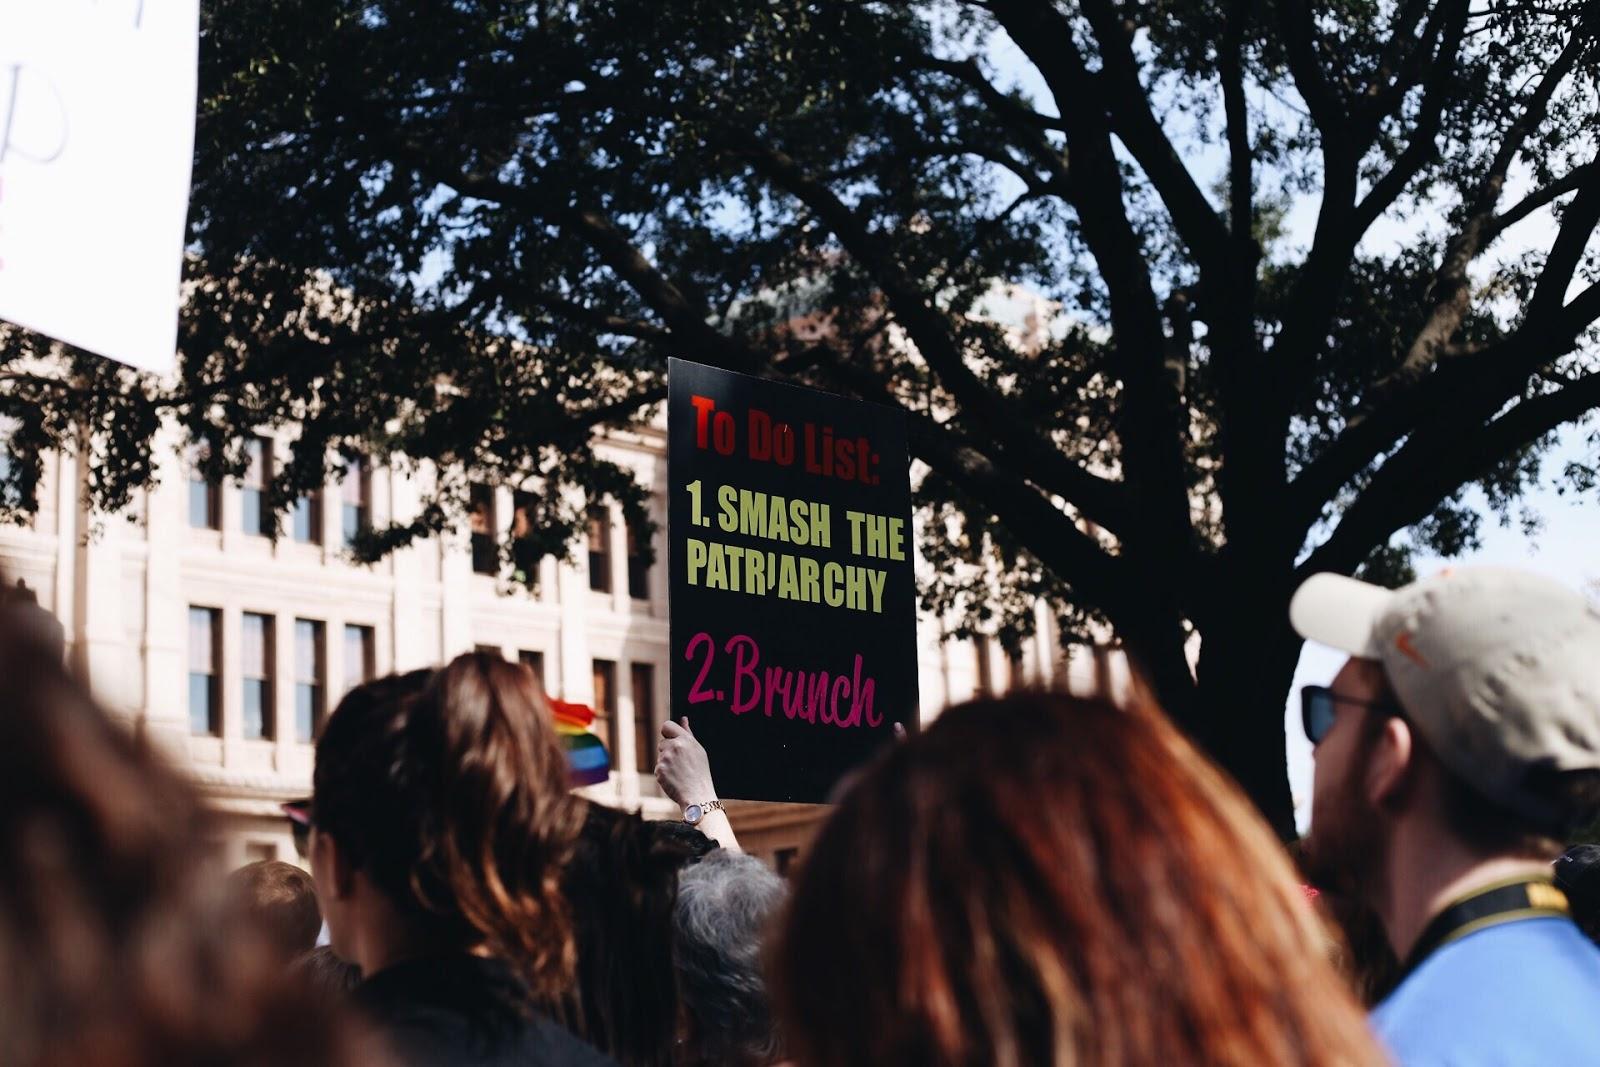 kyler wesp, woman, protest, politics